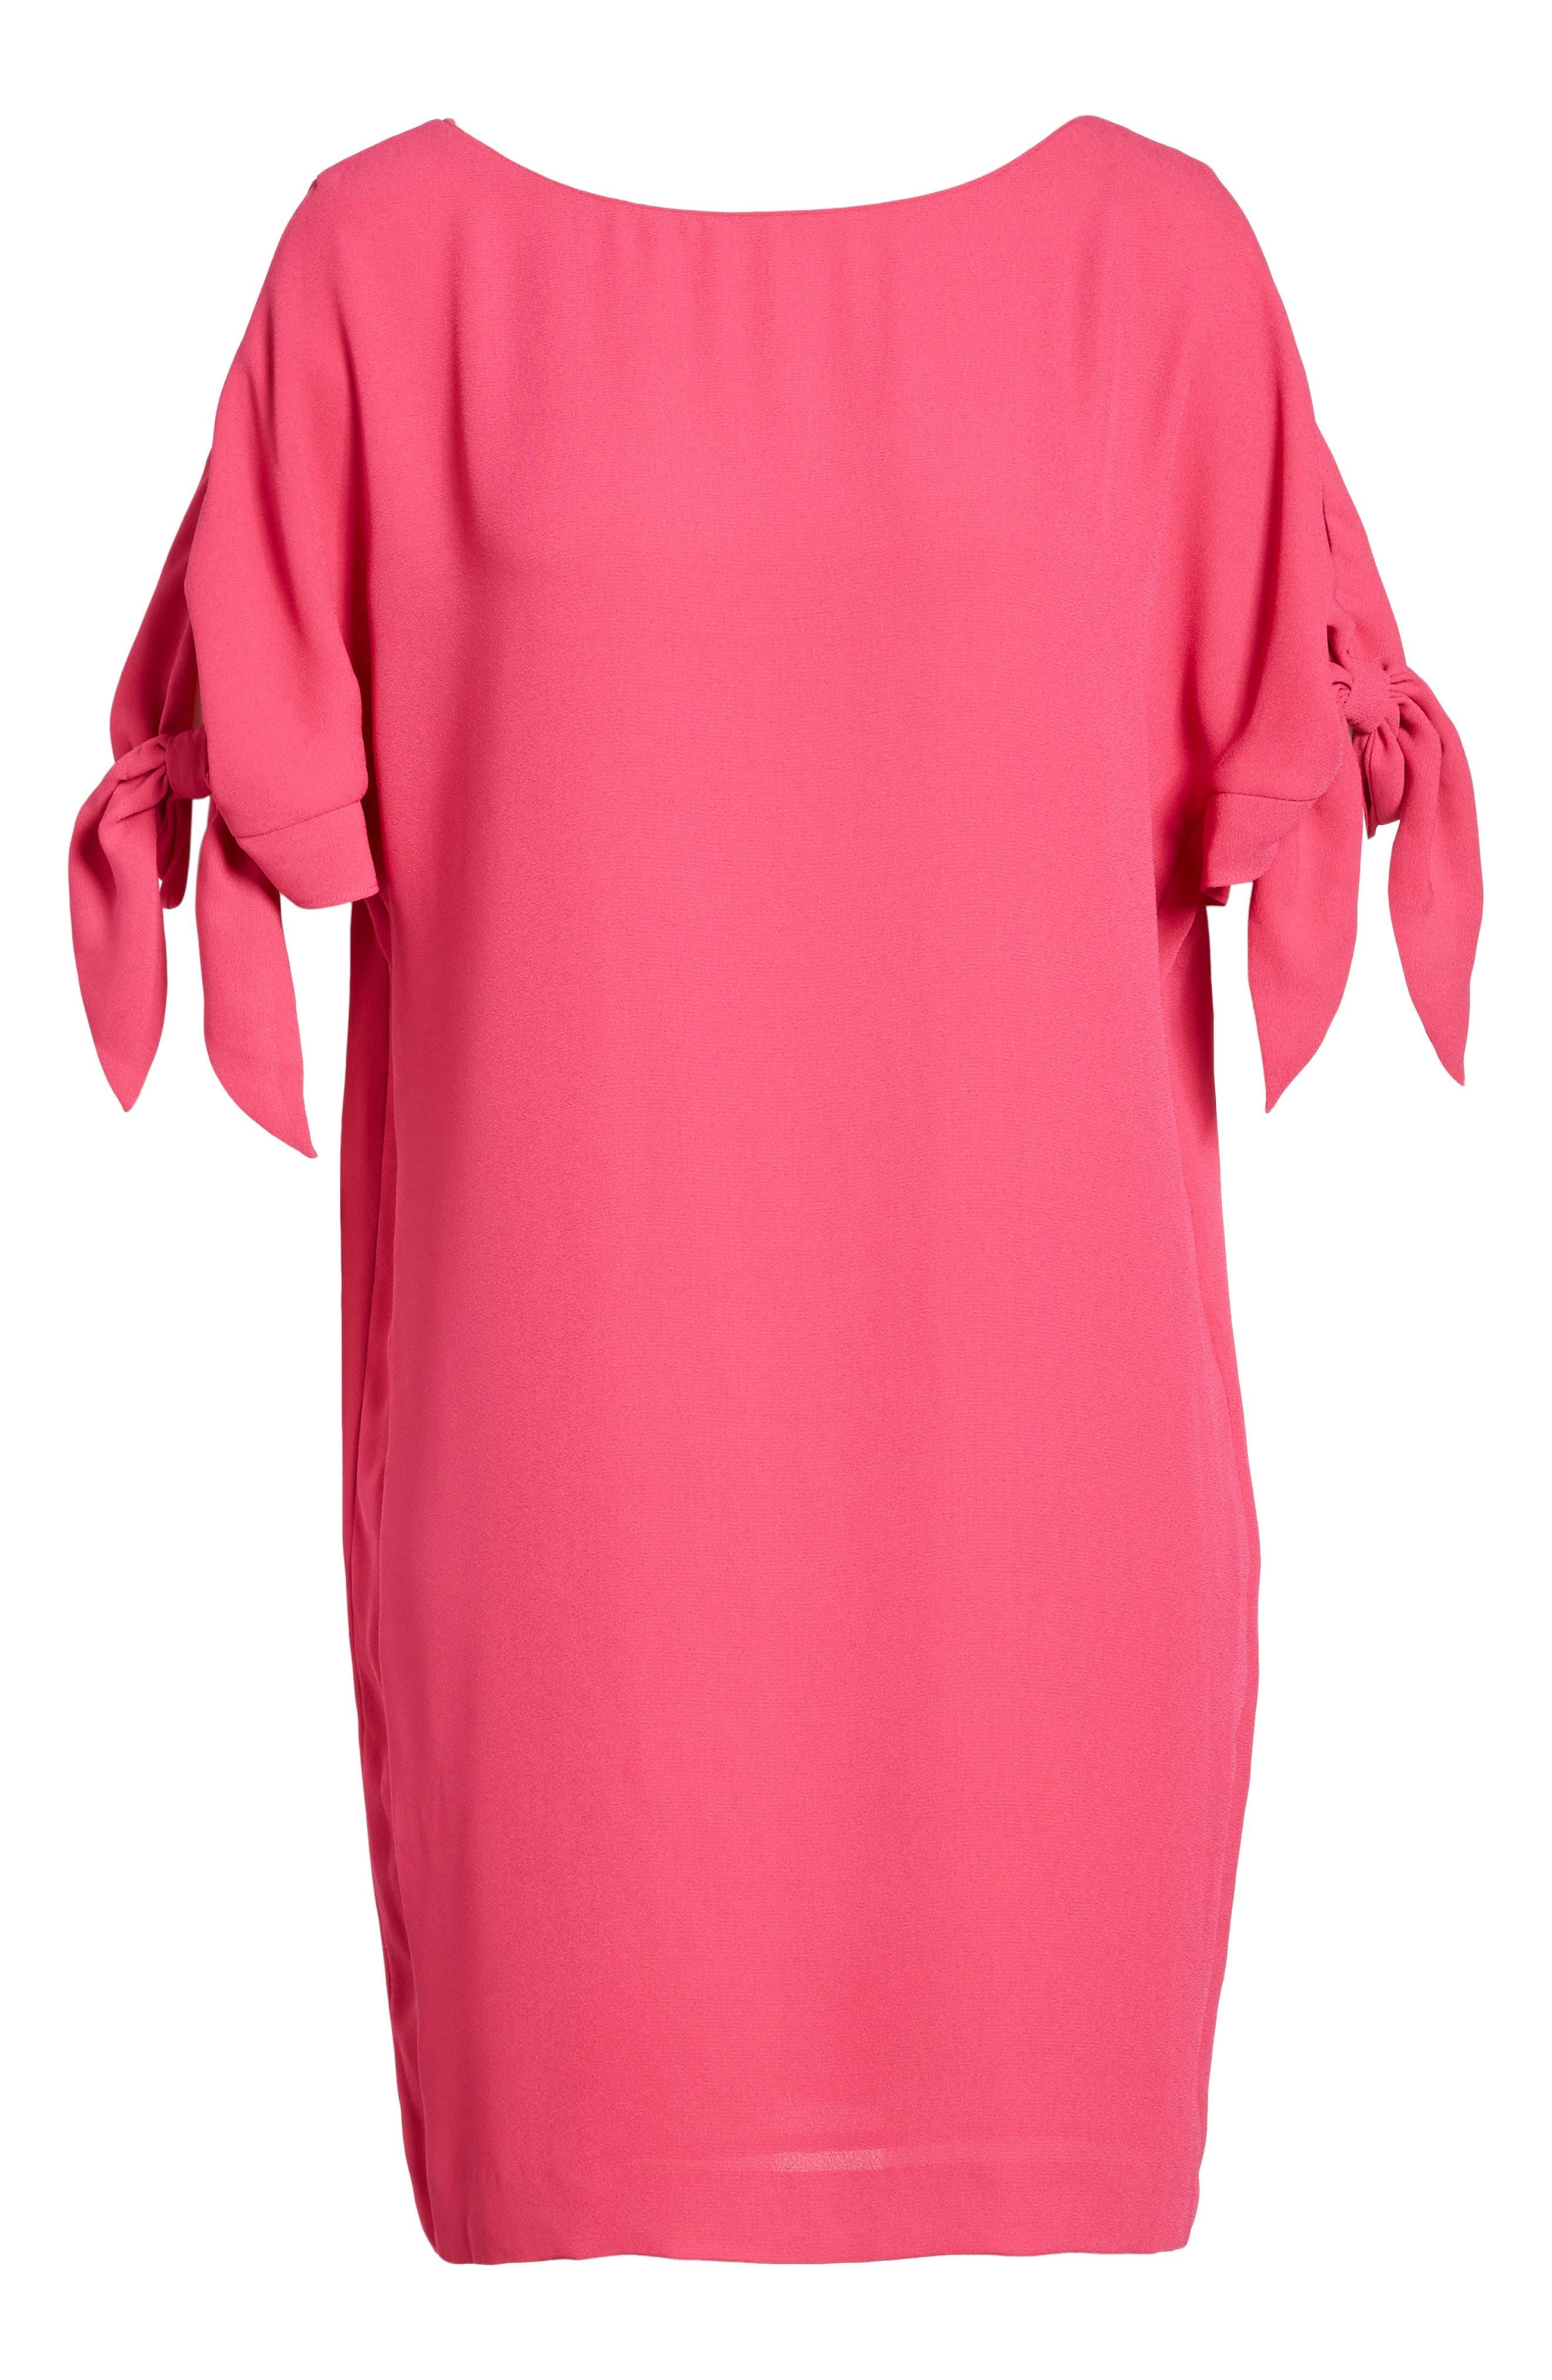 VINCE CAMUTO, Cold Shoulder Shift Dress, Alternate thumbnail 2, color, 660